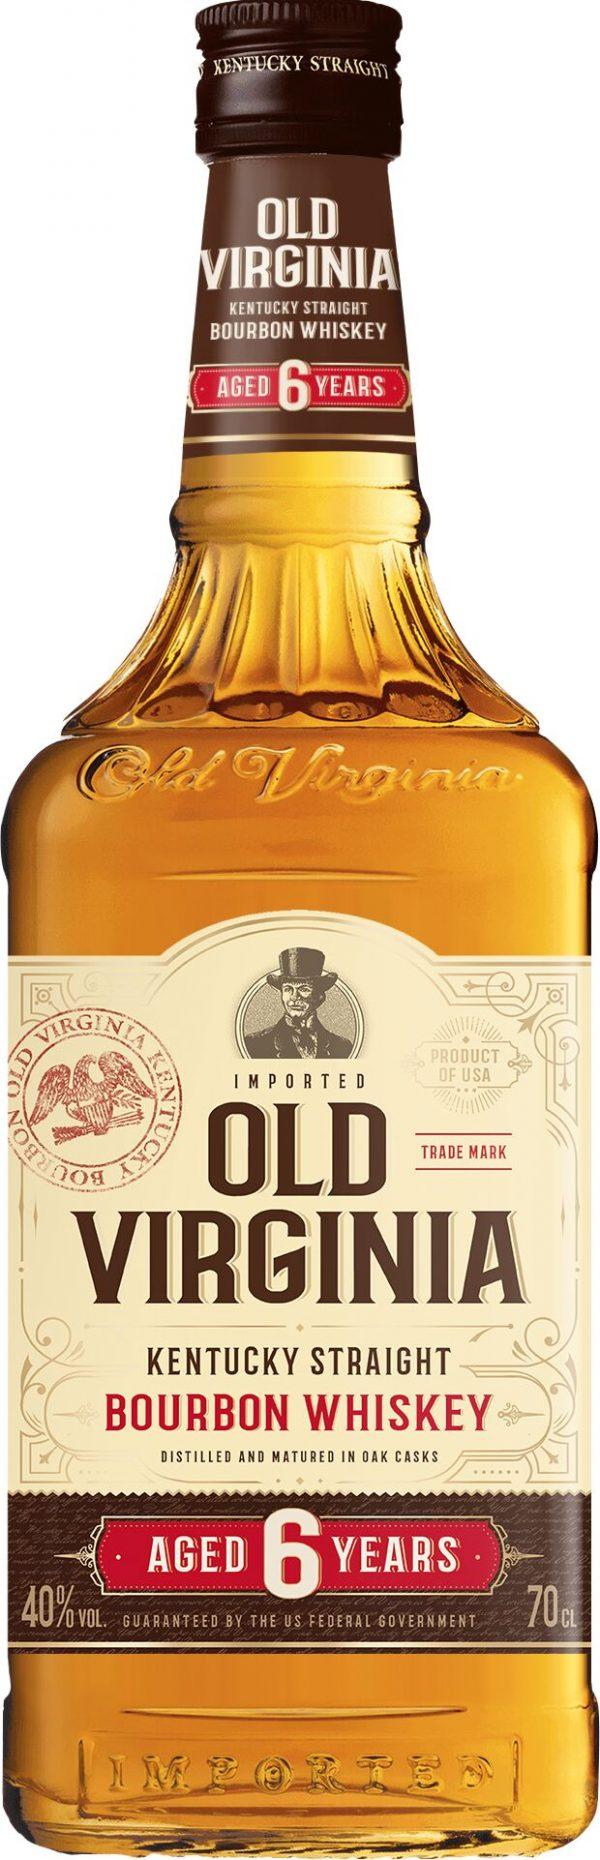 Old Virginia 6 Years Old Kentucky Straight Bourbon 70cl